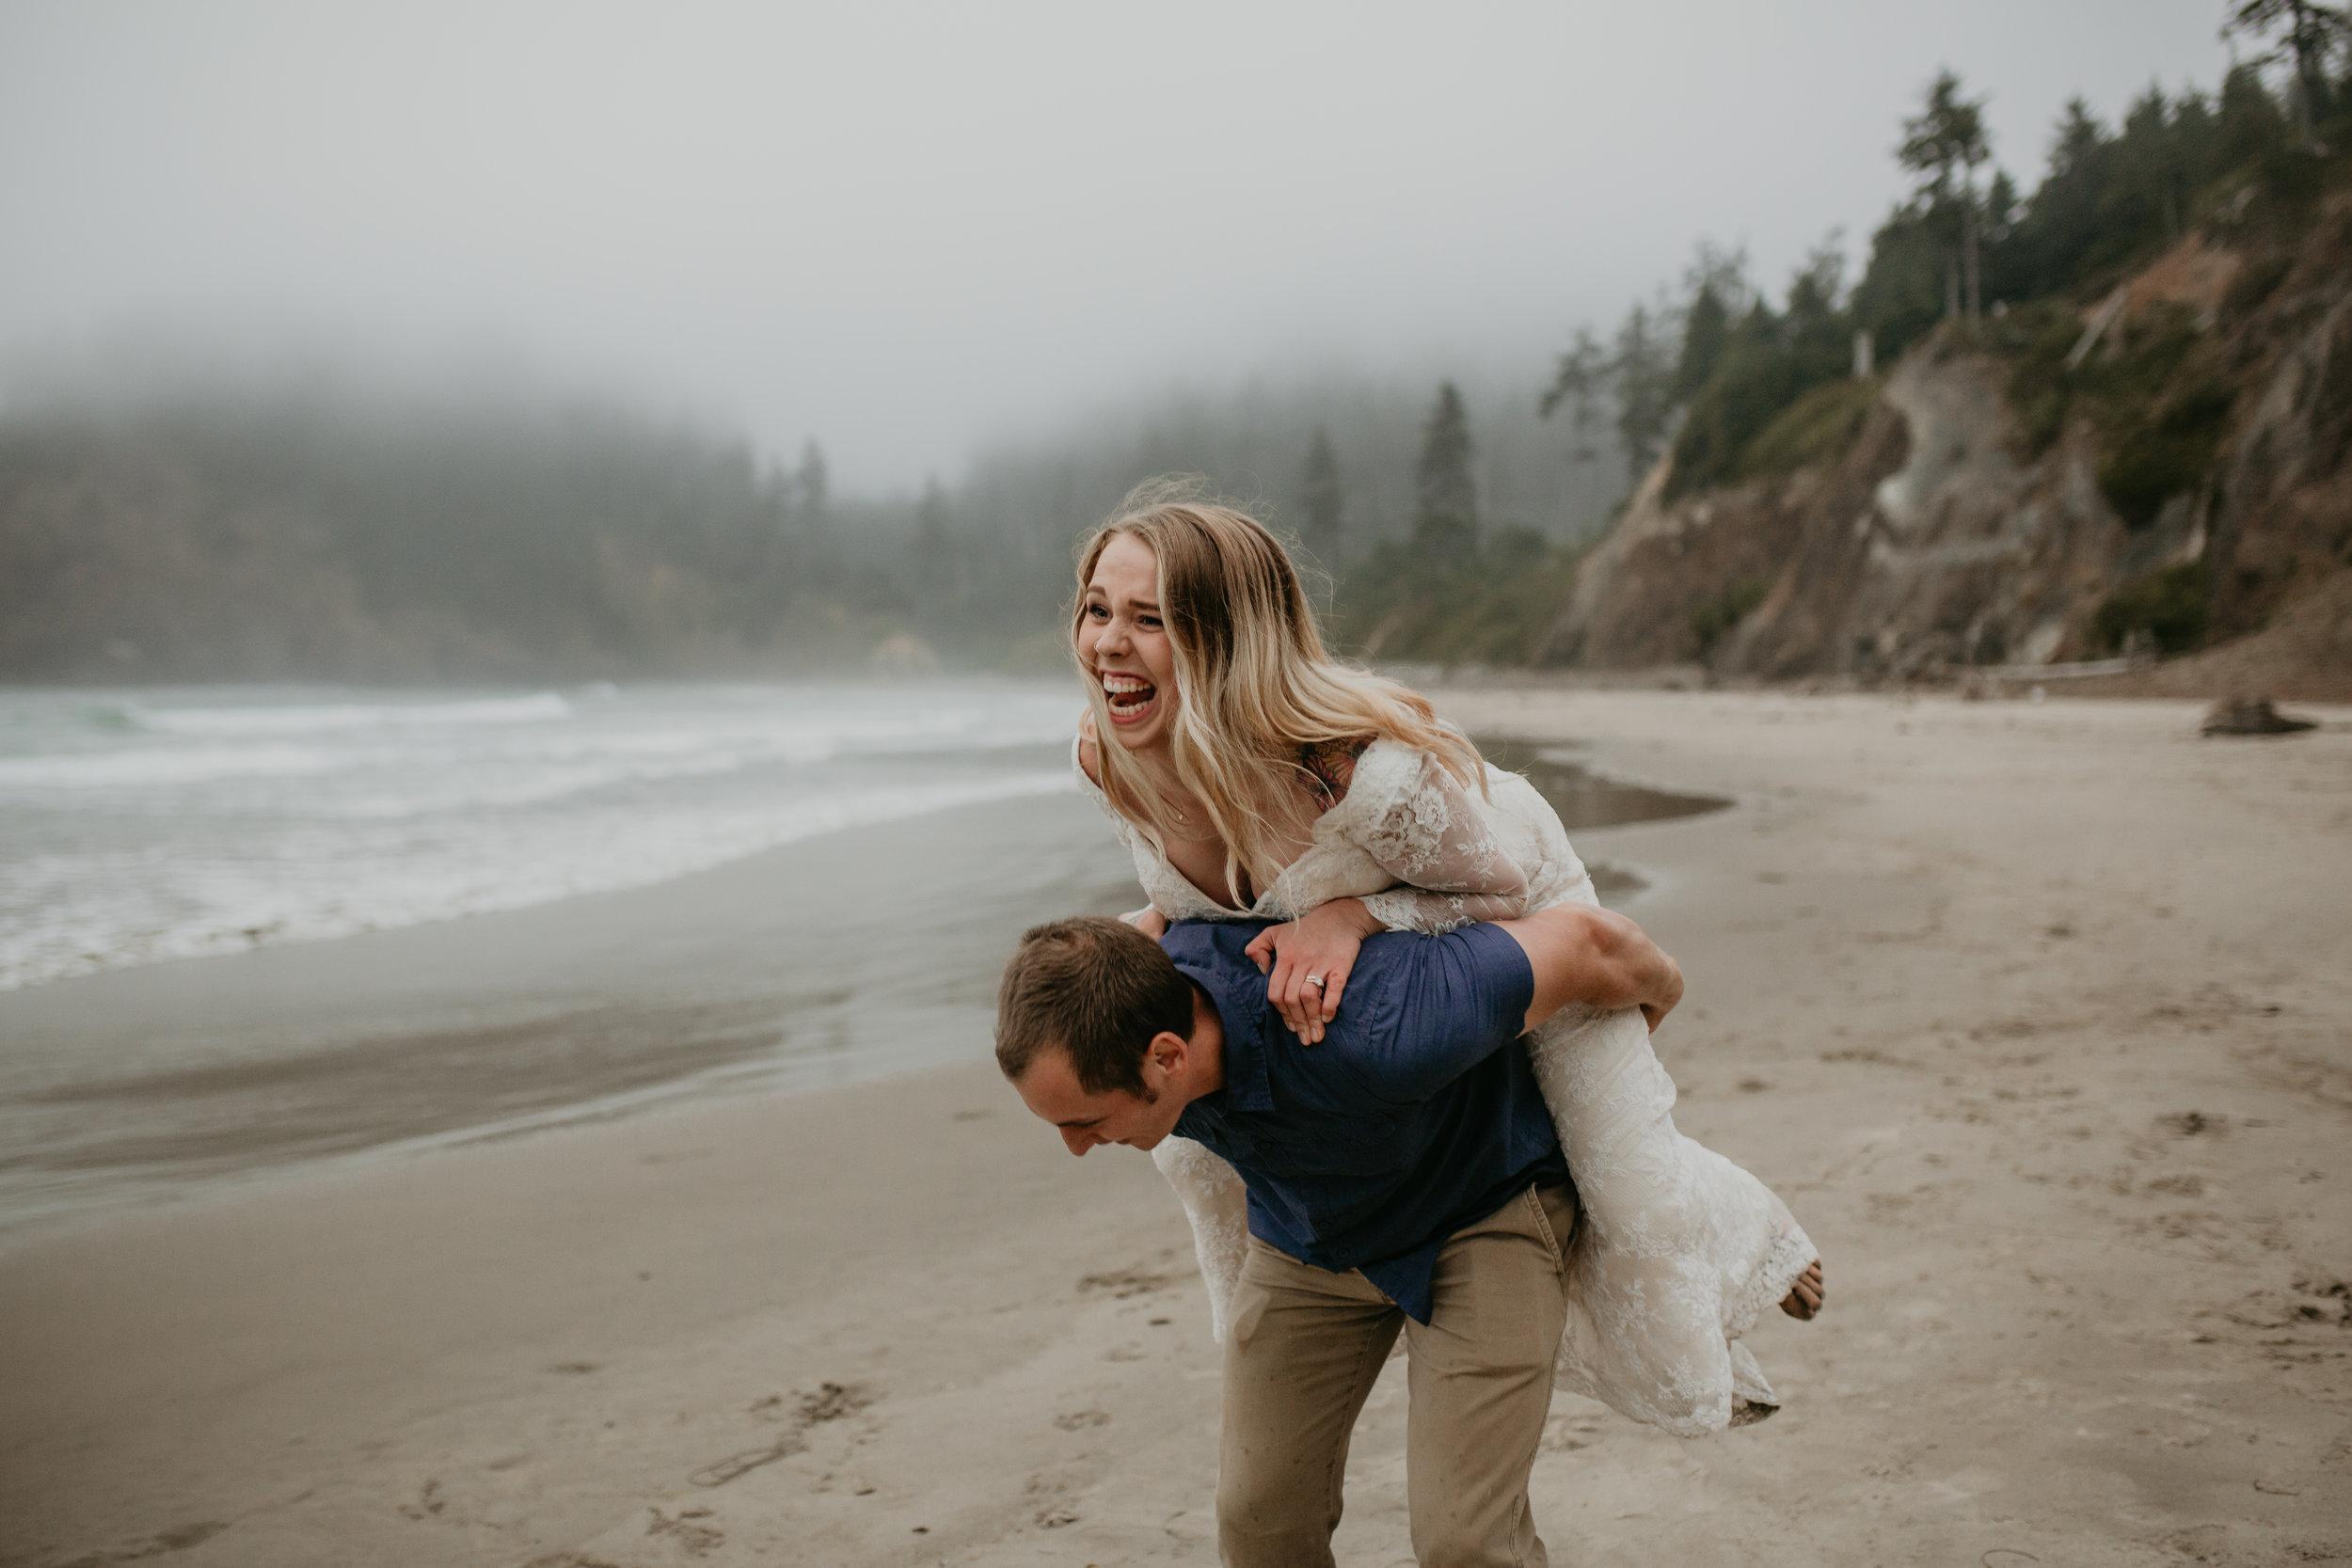 nicole-daacke-photography-ecola-state-park-oregon-elopement-bridal-photos-photographer-for-cannon-beach-elopement-oregon-coast-elopement-photographer-foggy-summer-elopement-cannon-beach-best-adventure-elopement-photographer-7083.jpg